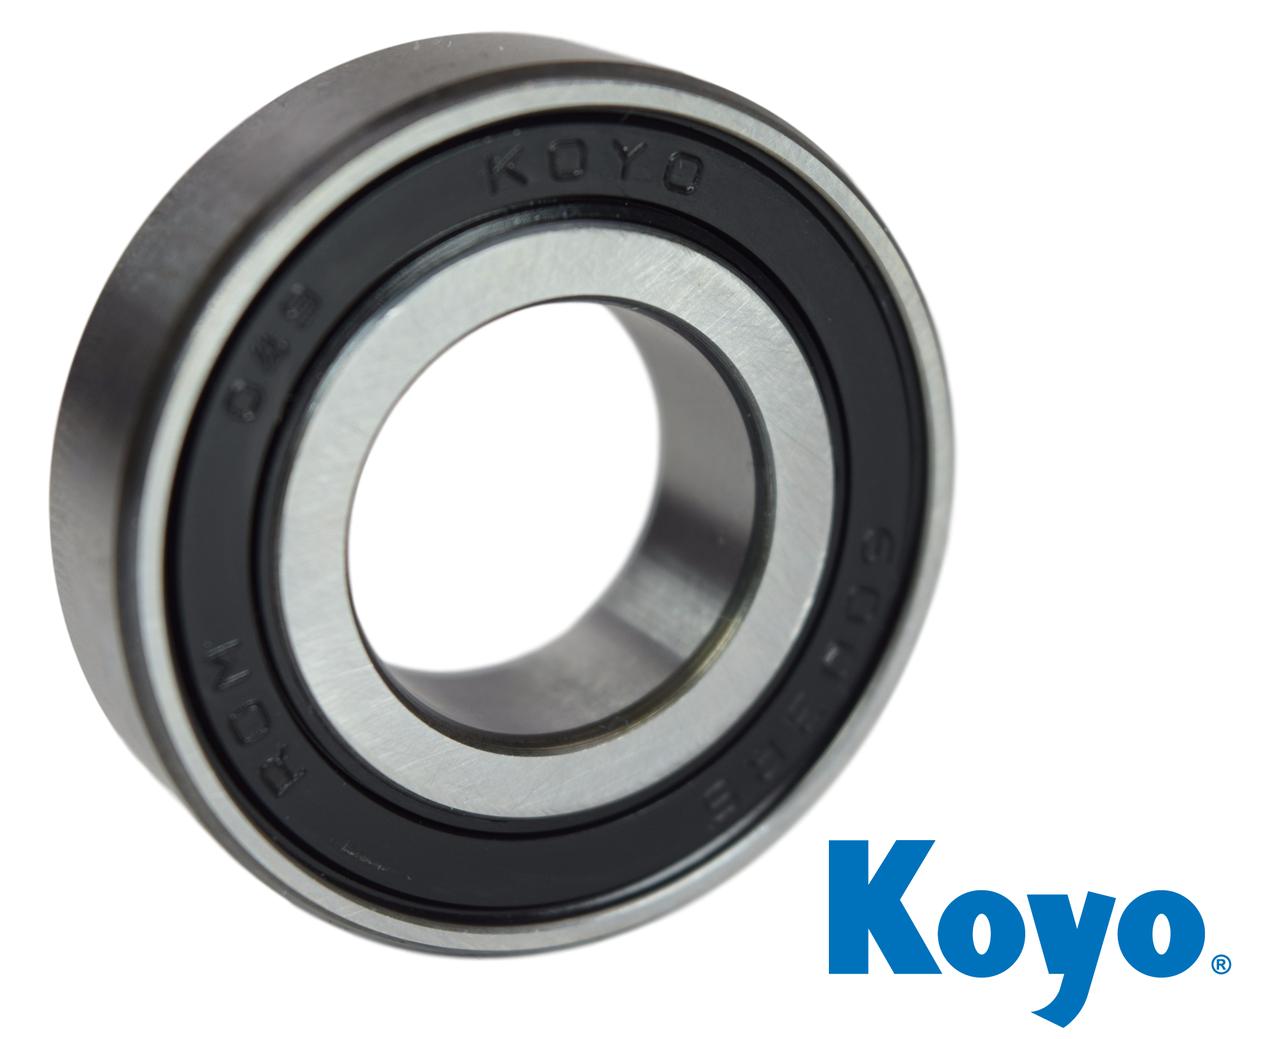 Koyo 6003-2RSC3 Radial Ball Bearing 17X35X10 Image